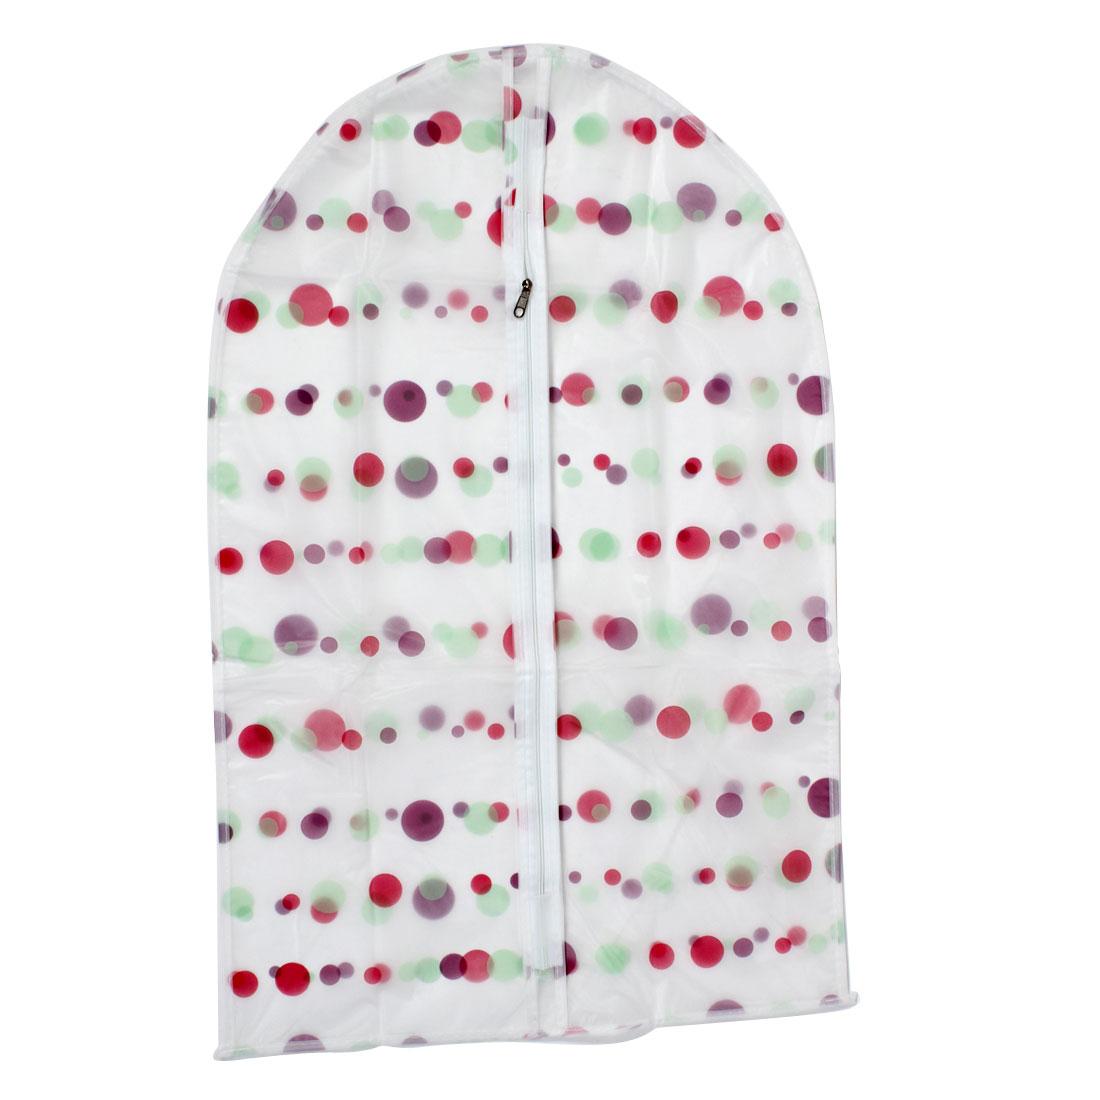 "Clothes Suit Garment PEVA Dots Printed Zip Up Dustproof Cover Bag 27"" Length"